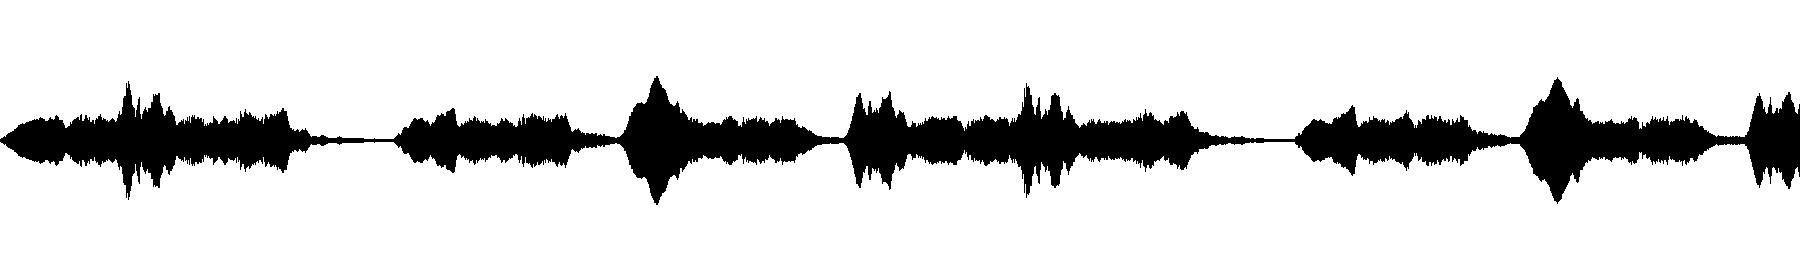 fire tape flute   160bpm   bmaj